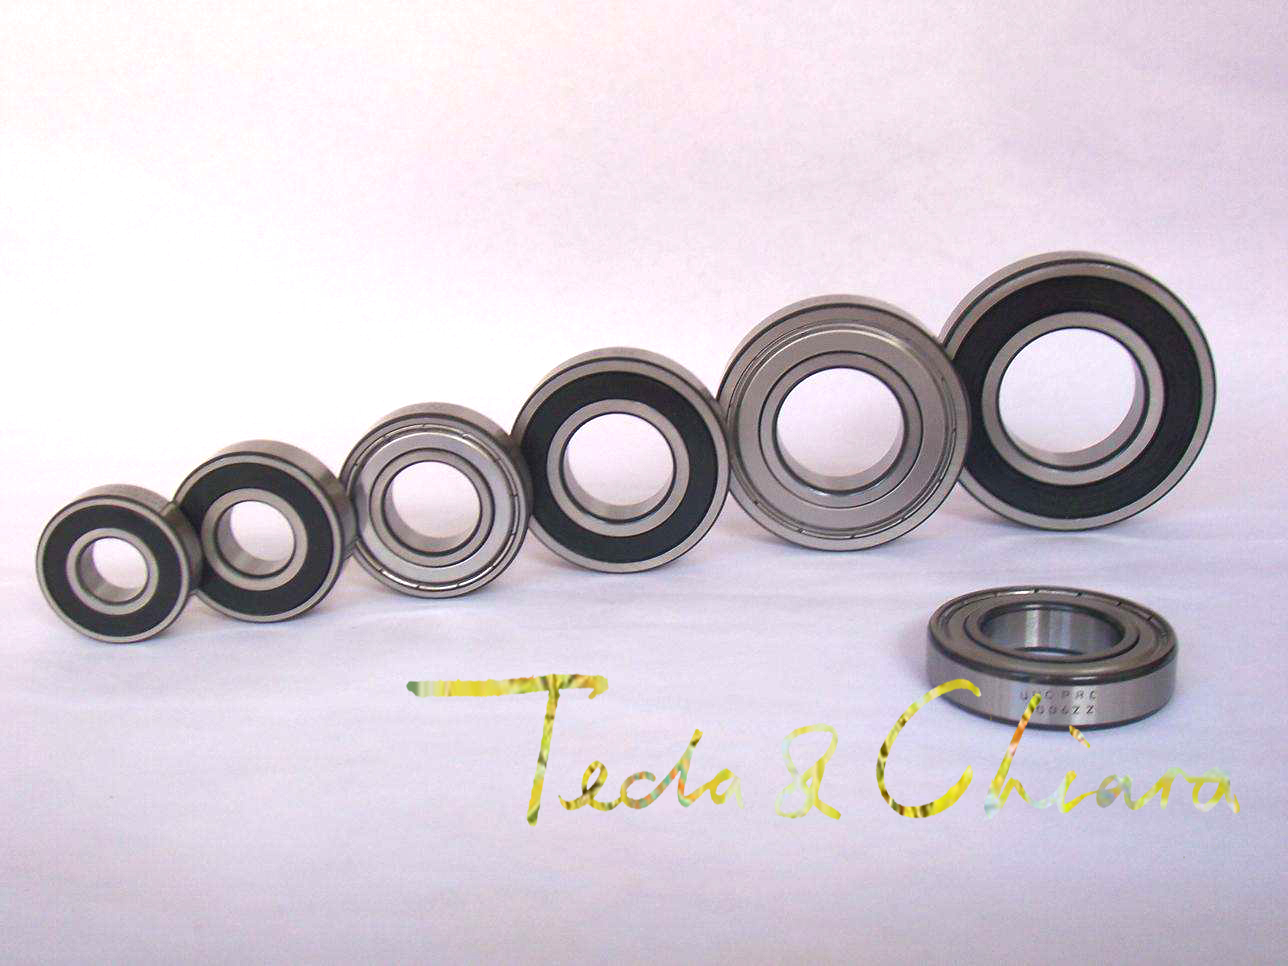 Full Balls Bicycle Pivot Repair Parts 1 PC 6802-2RSV MAX Bearing 15*24*5mm